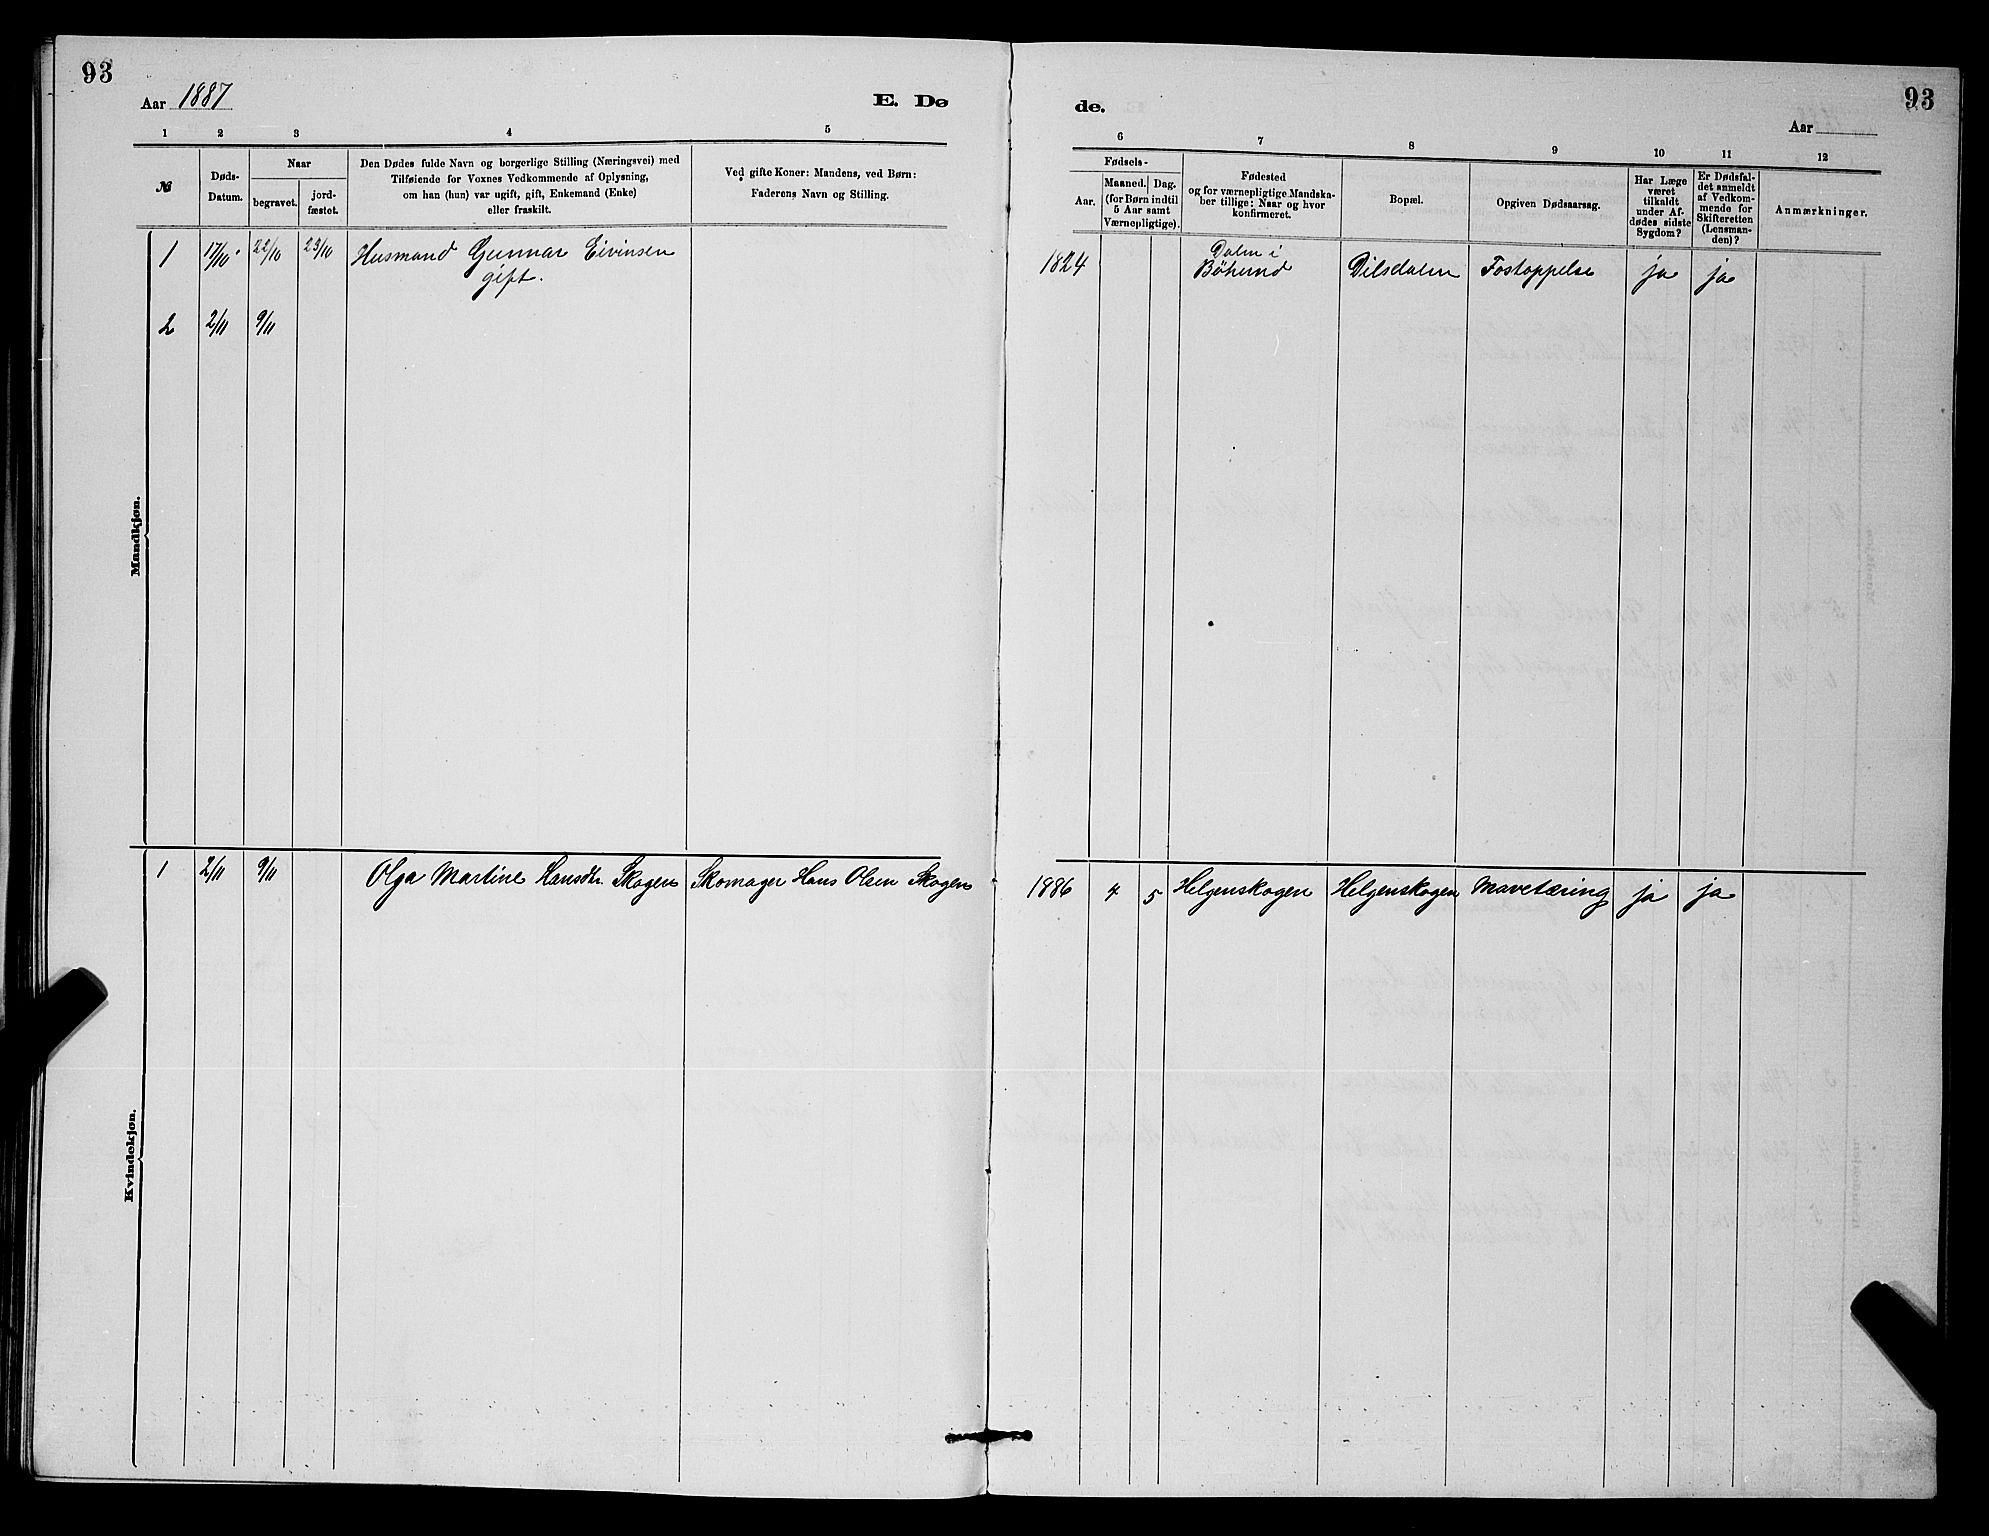 SAKO, Holla kirkebøker, G/Gb/L0001: Klokkerbok nr. II 1, 1882-1897, s. 93